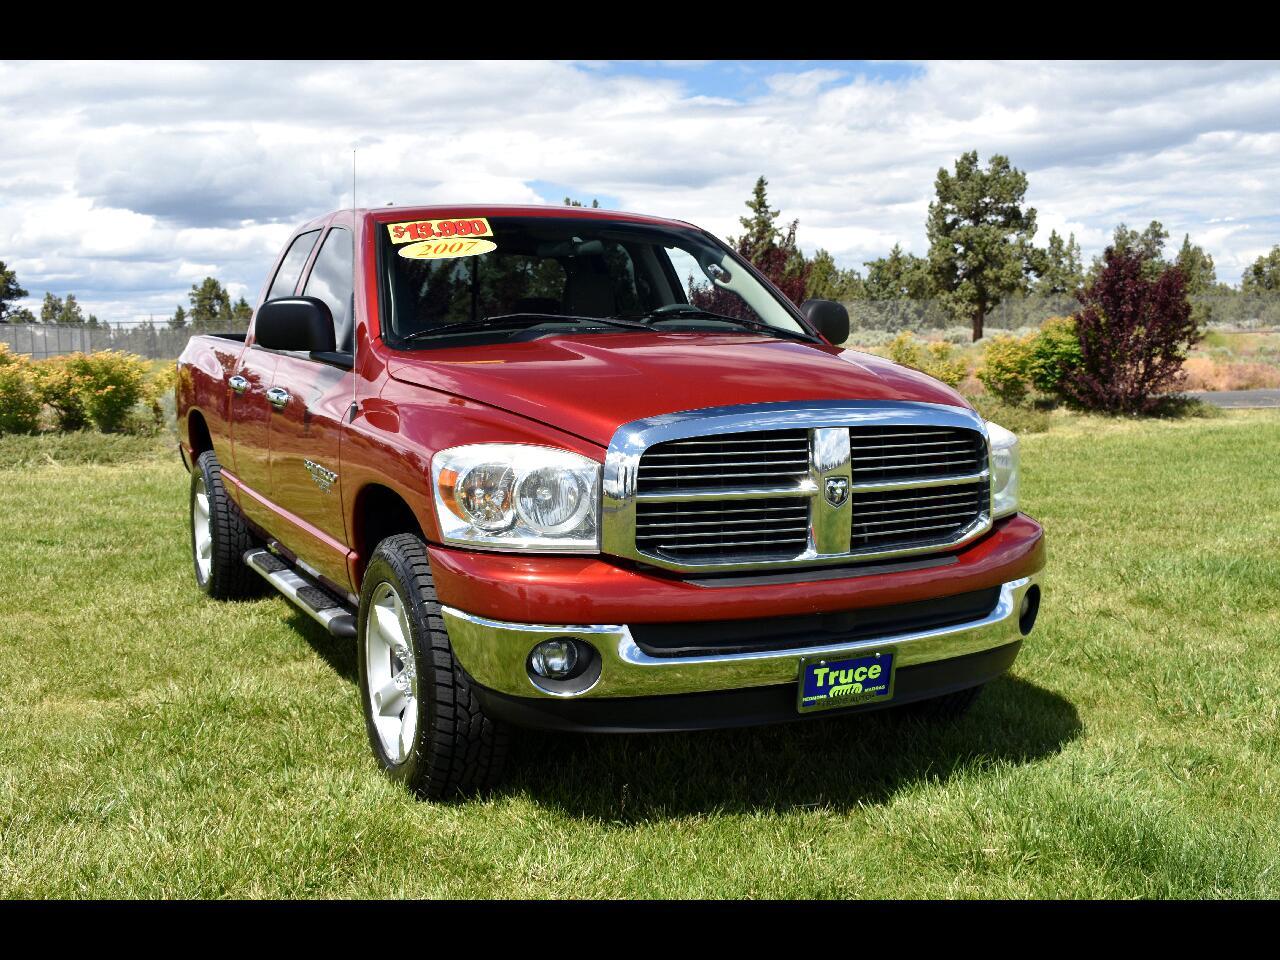 2007 Dodge Ram 1500 4WD QUAD CAB SLT***MANUAL***